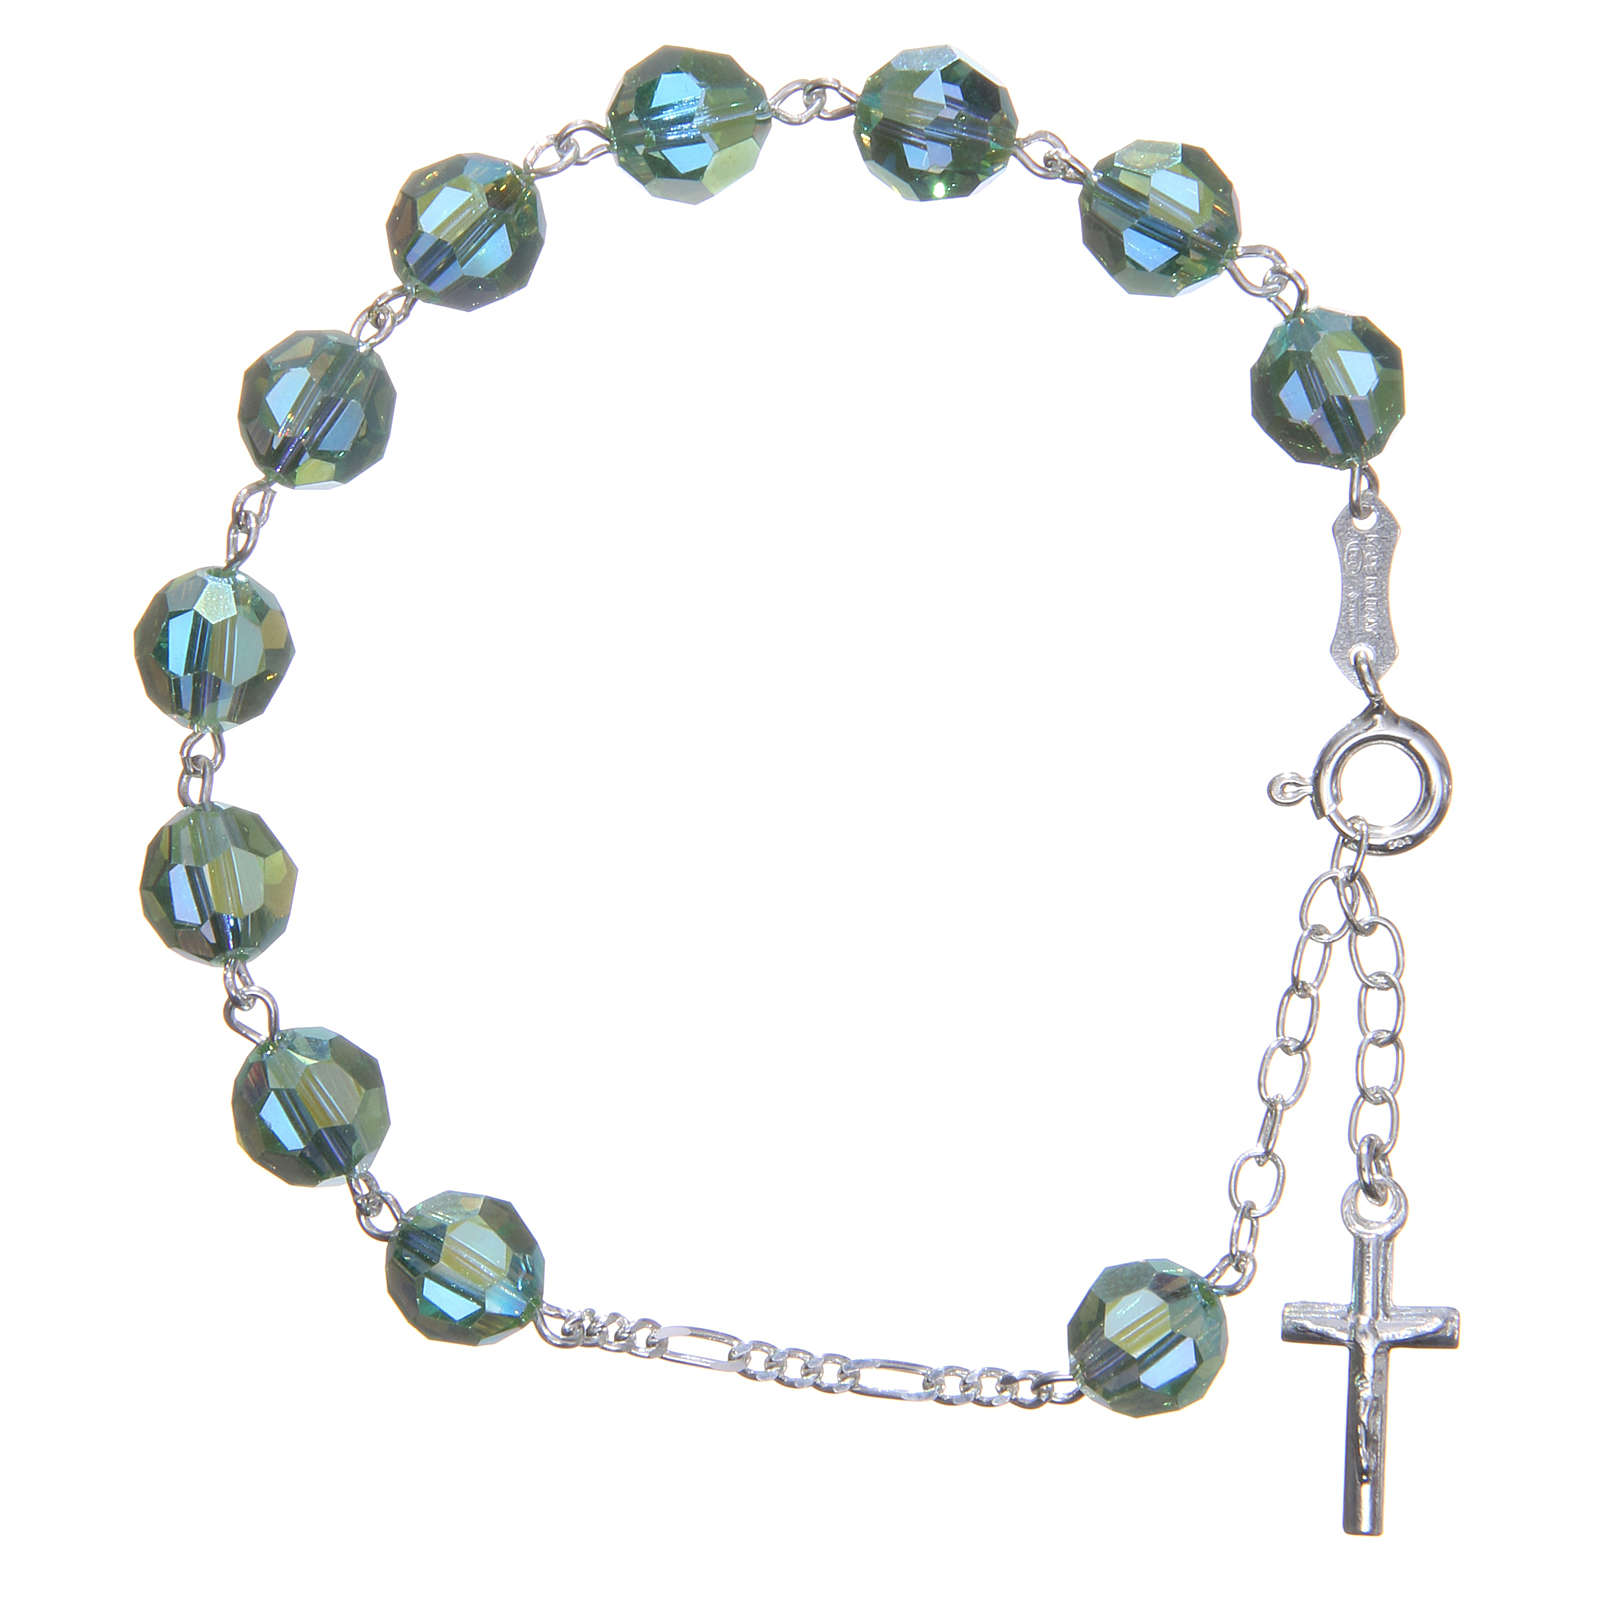 Zehner Armband Silber 800 grünen Swarovski Perlen 8mm 4